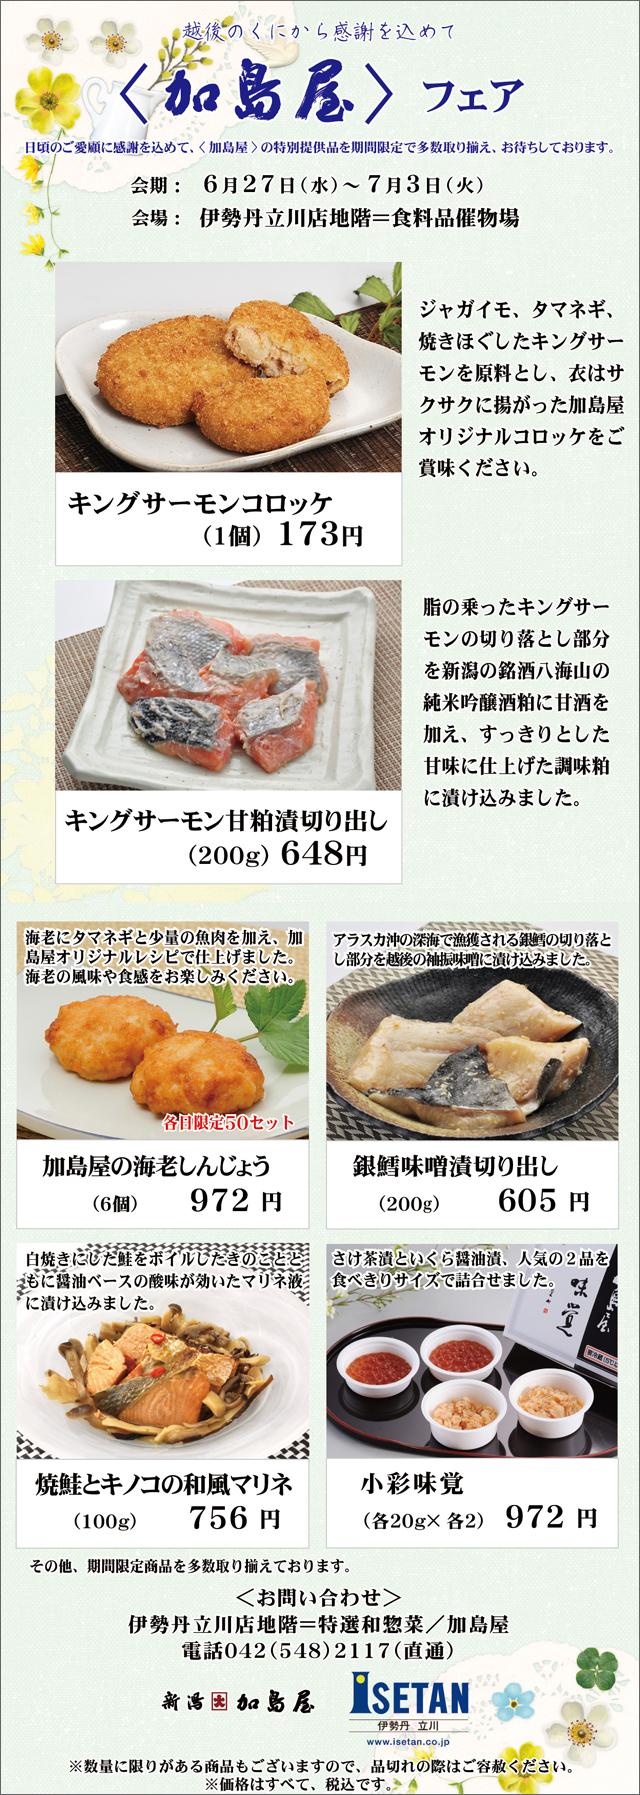 2018/6/26伊勢丹立川店「加島屋フェア」